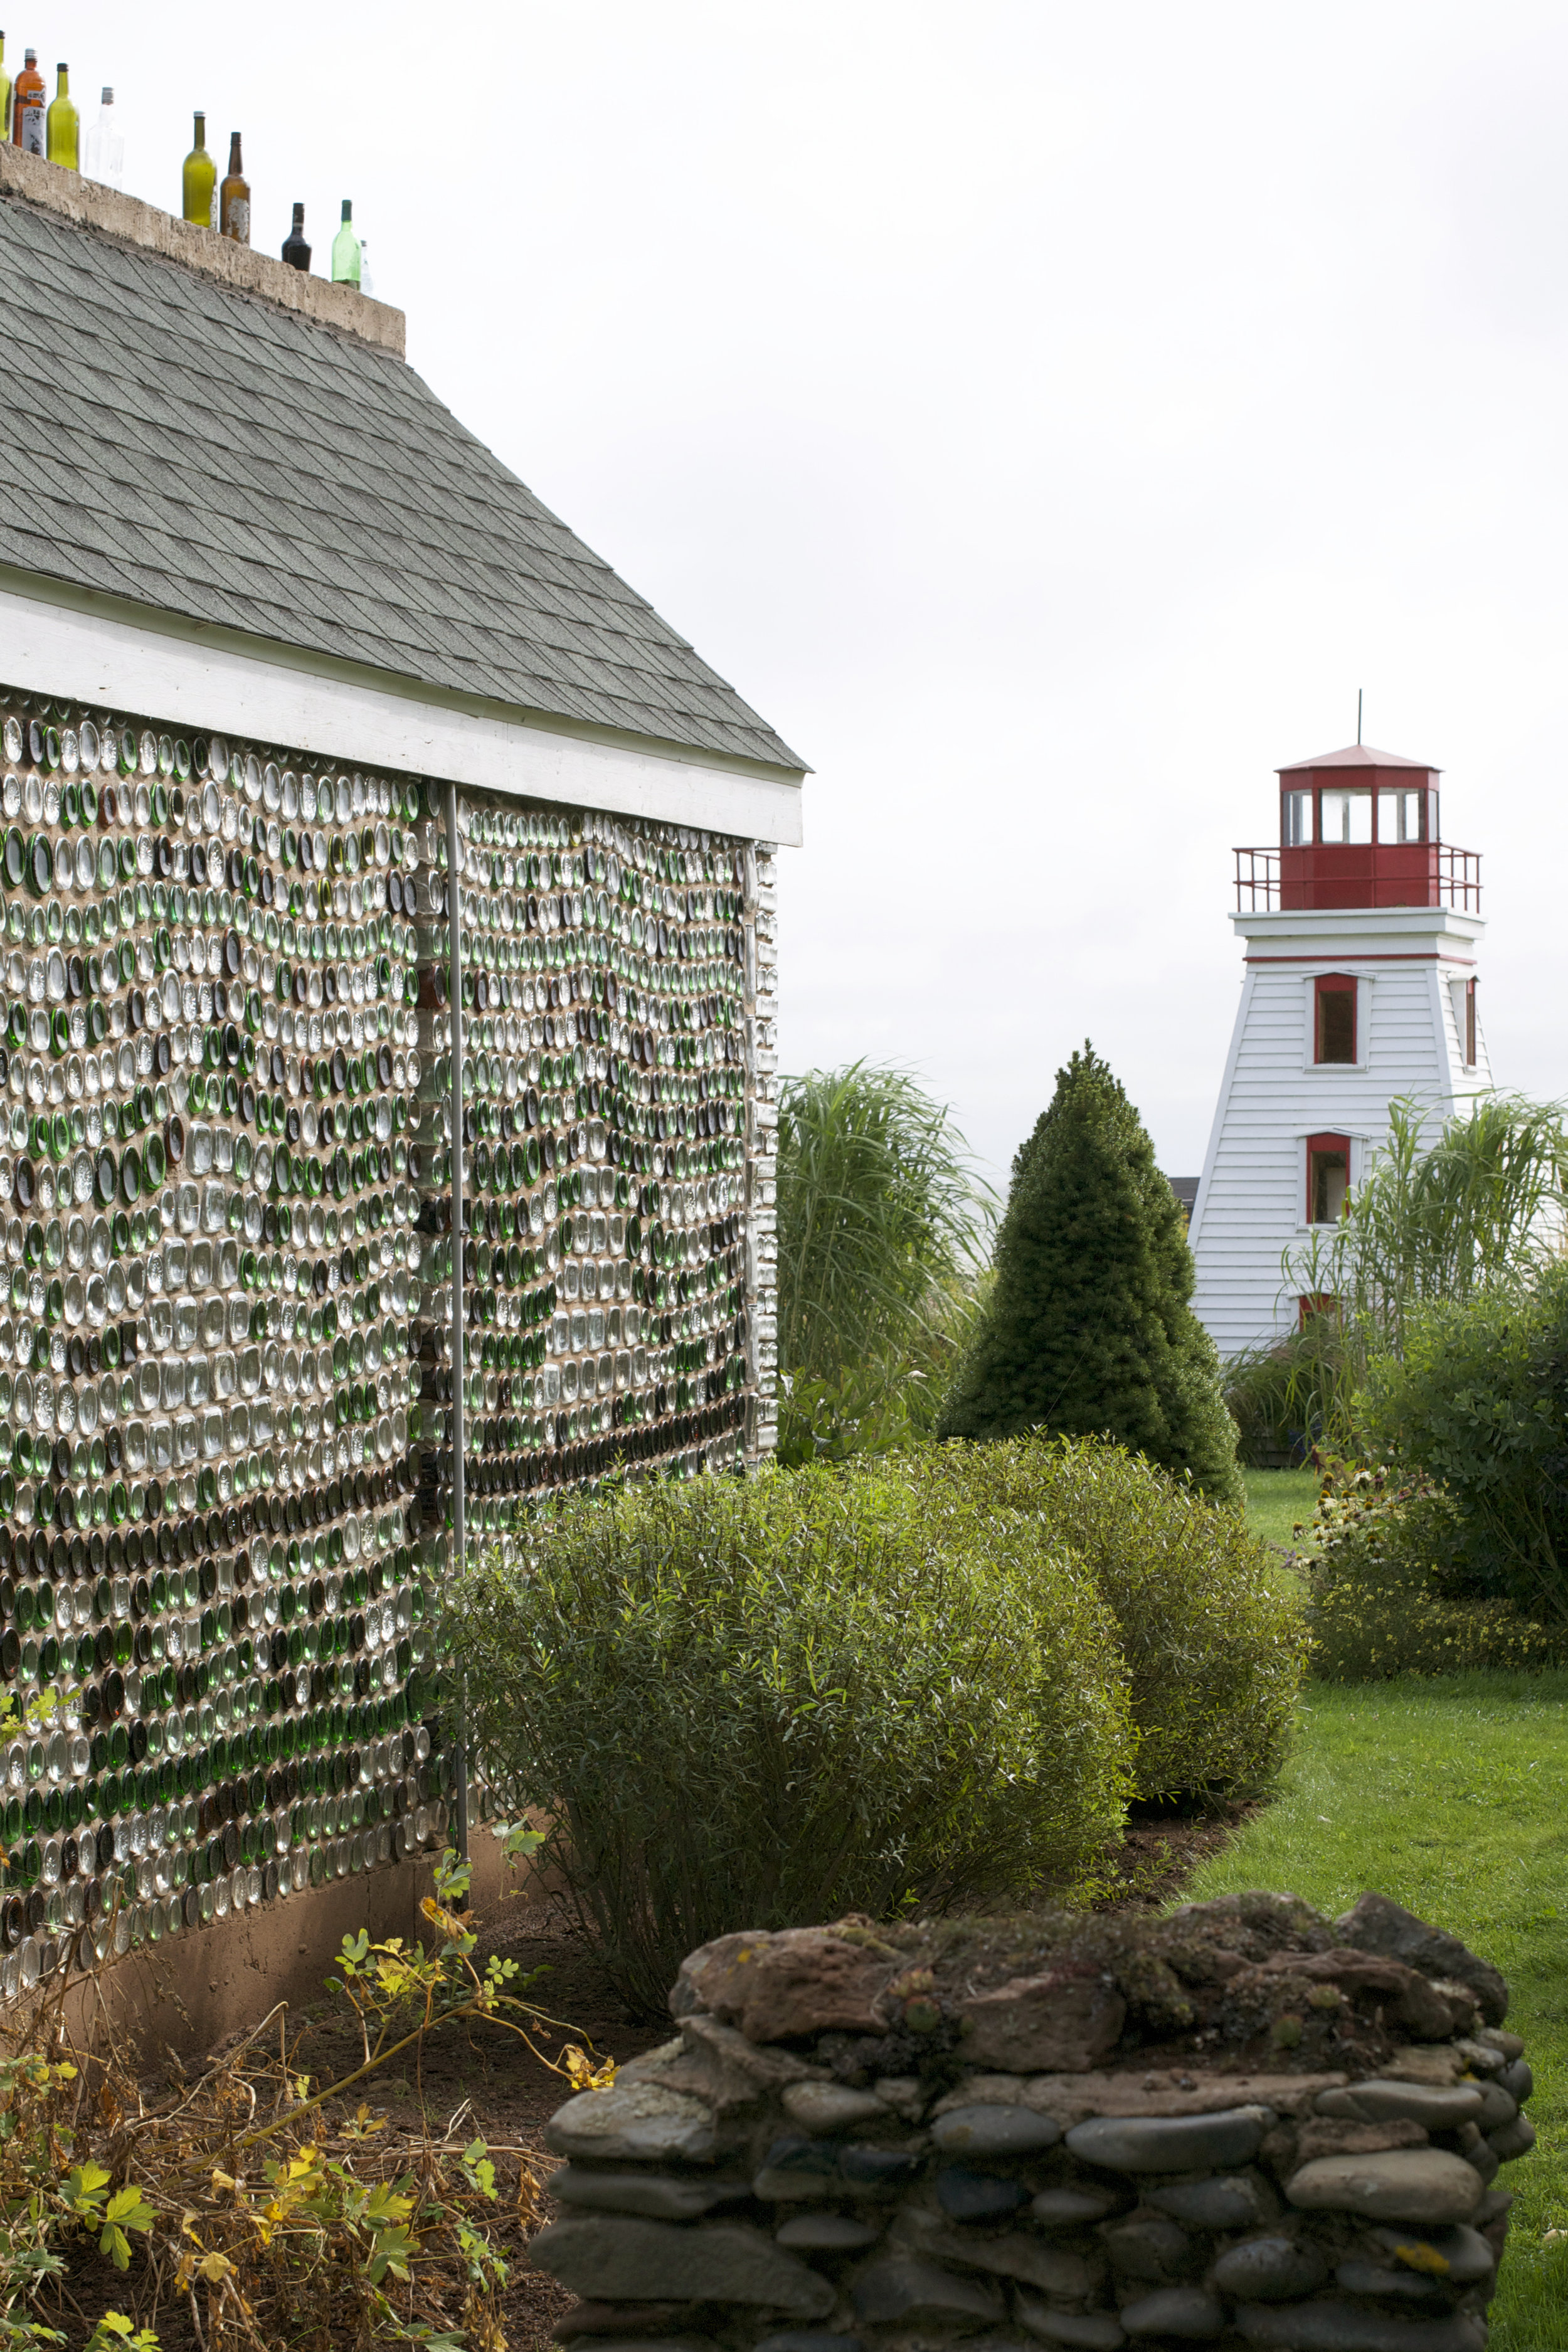 bottle-house-side-to-lighthouse.jpg